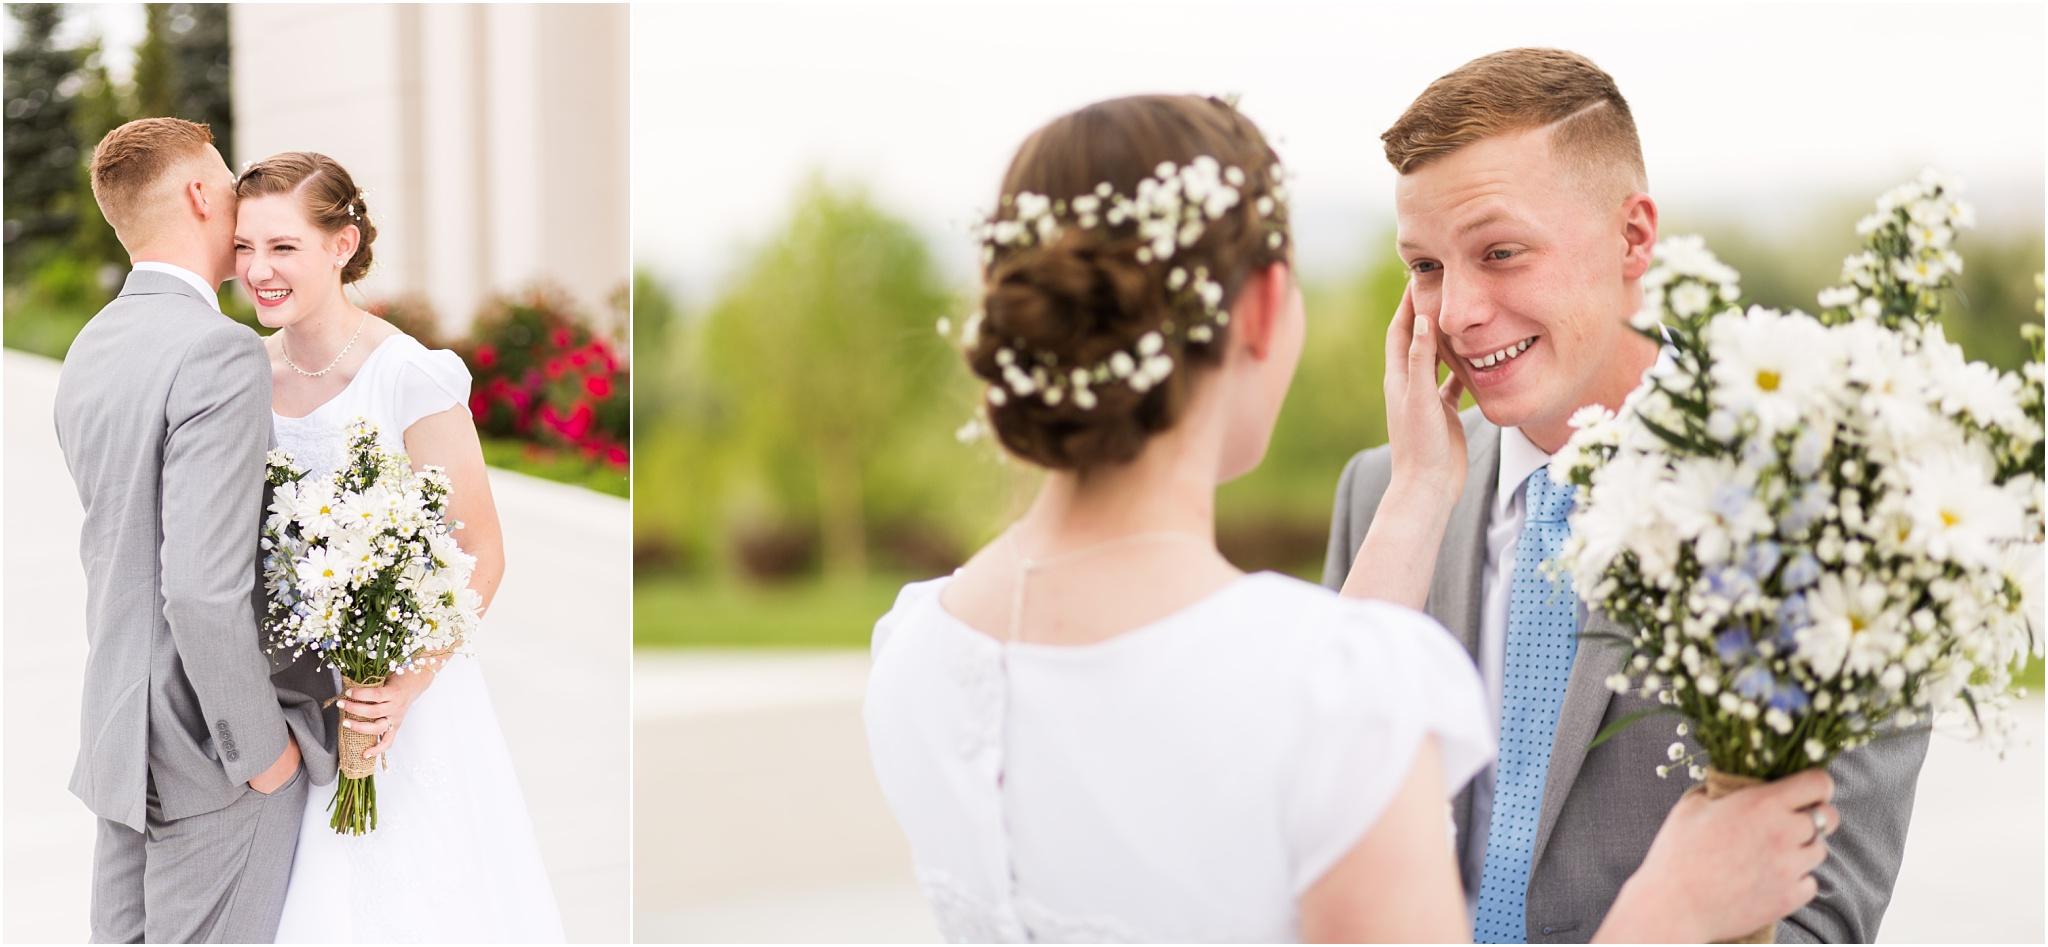 Wedding Photography_Meridian Idaho Temple_Boise Idaho_Leah Southwick Photography_0034.jpg